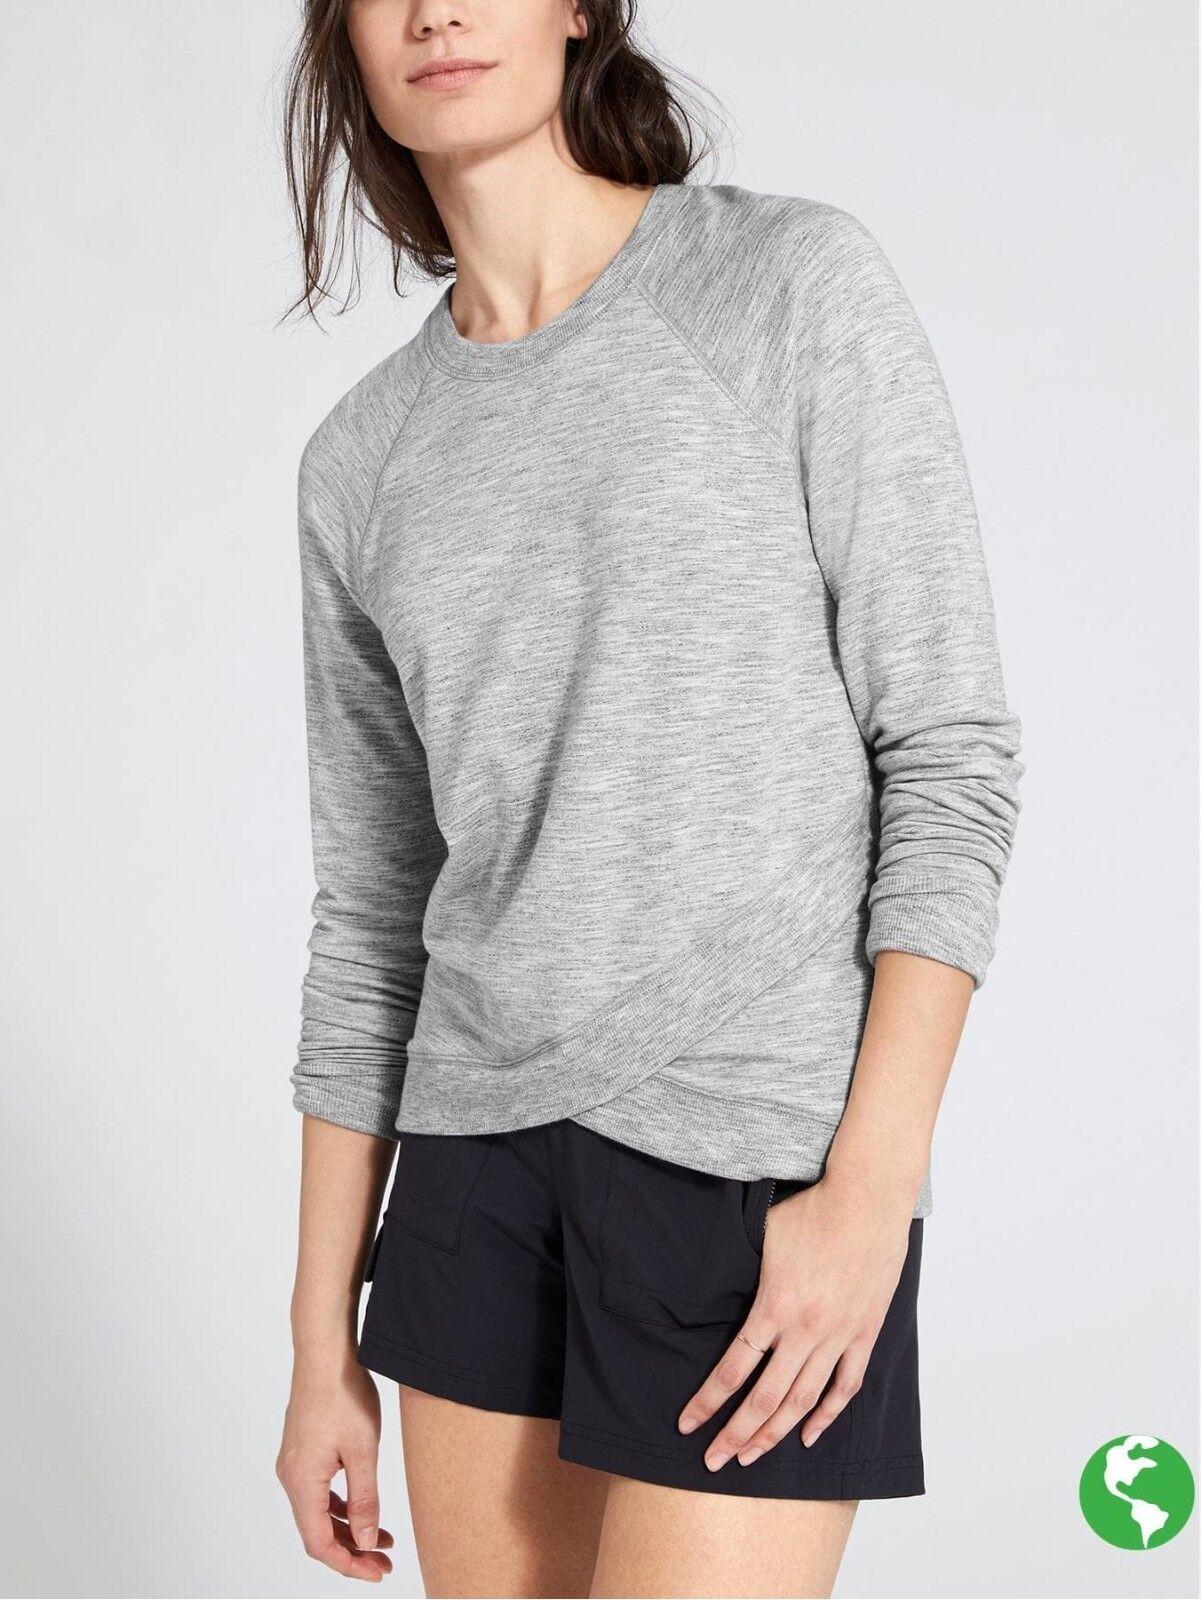 Athleta Criss Cross Sweatshirt, Marl Grey Heather  Size XL      N0413